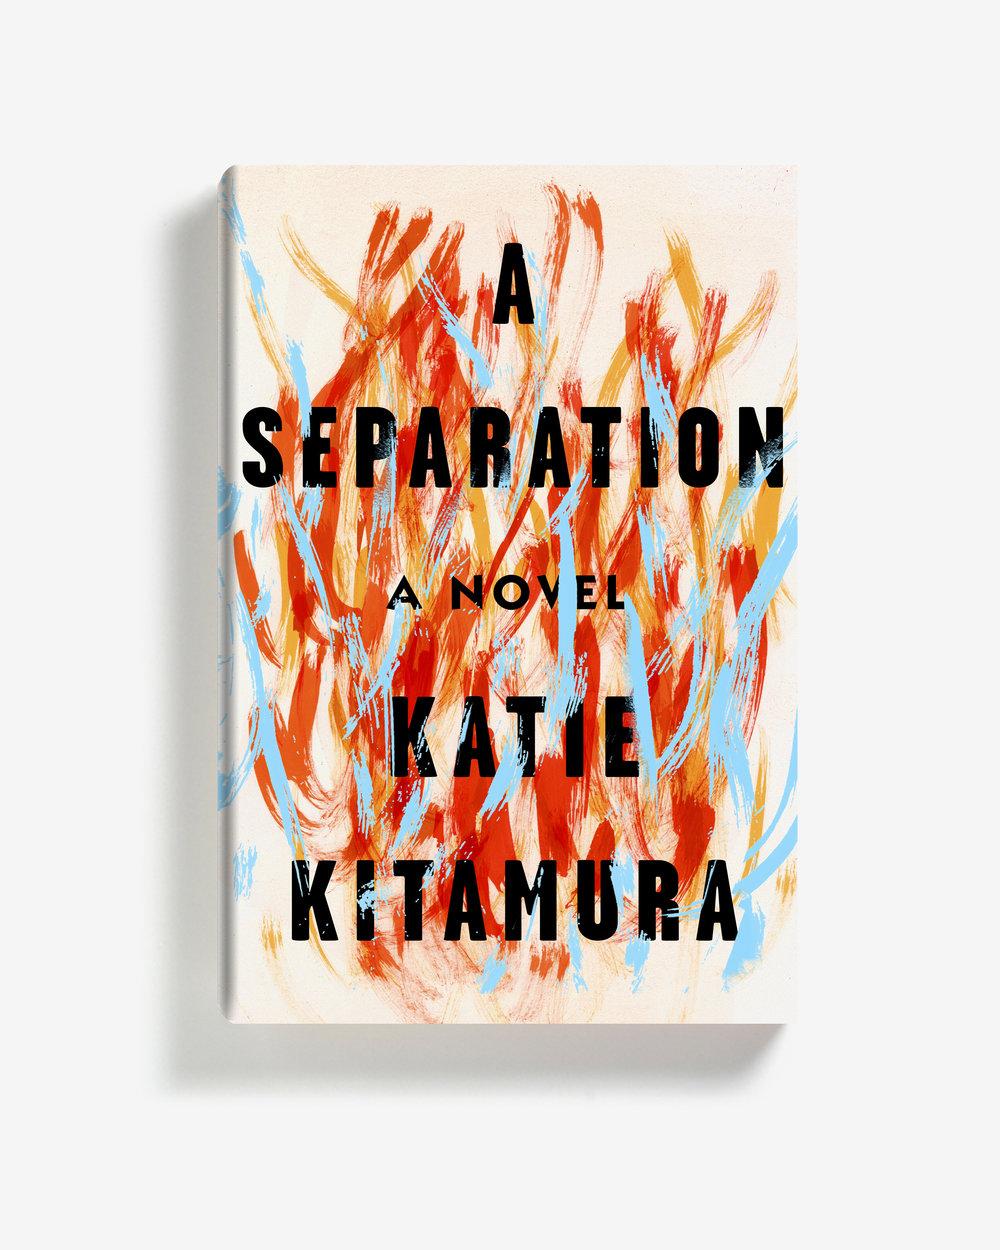 a+separation.jpg